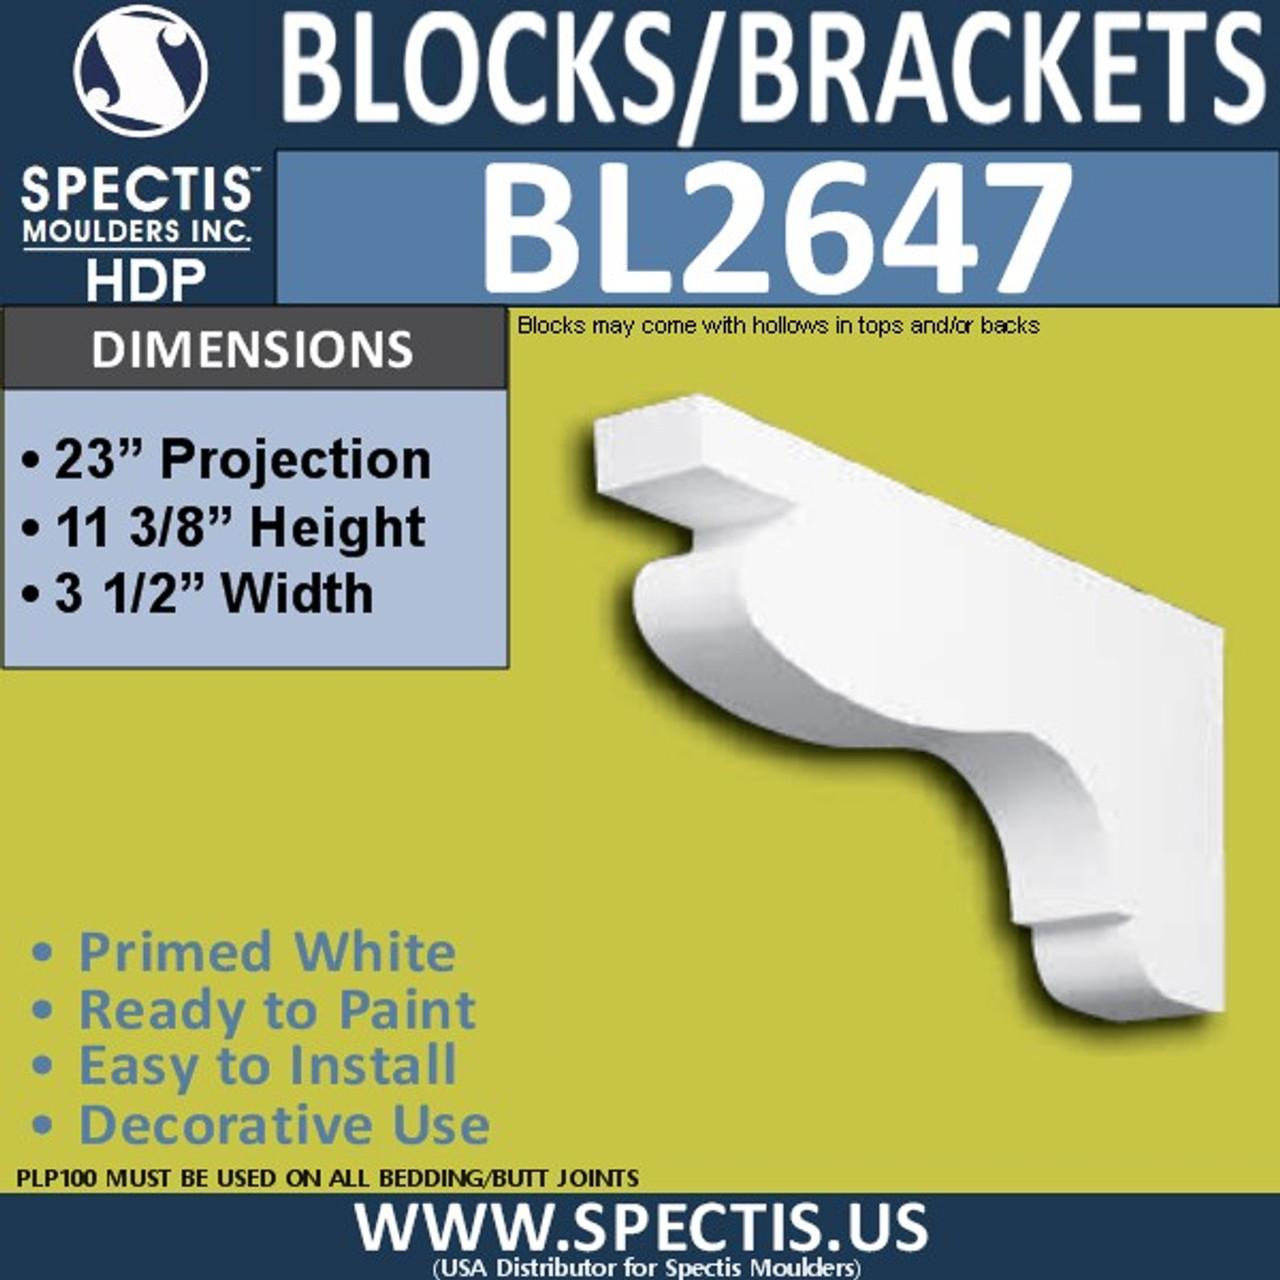 "BL2647 Eave Block or Bracket 3.5""W x 11.4""H x 23"" P"